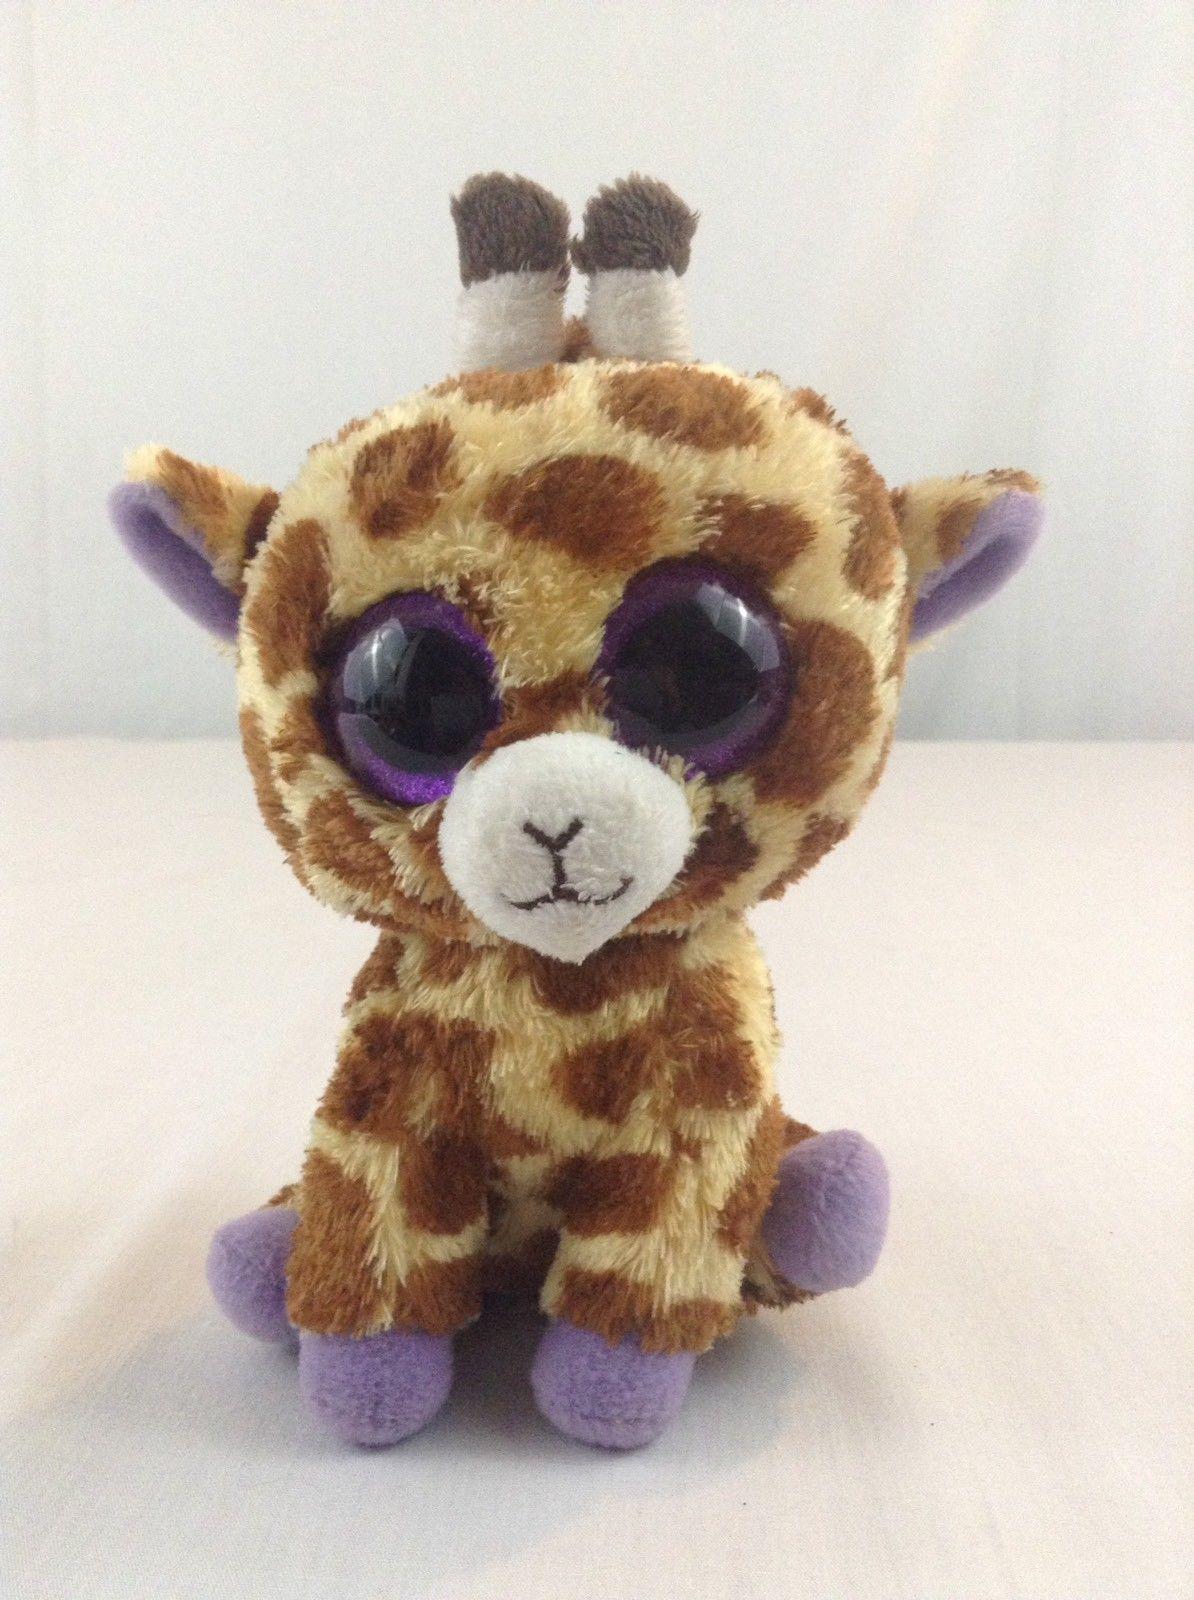 5bb3722dc70 S l1600. S l1600. Ty Beanie Baby Boo s Safari The Giraffe Glitter Eyes  Stuffed Plush Animal Toy ...